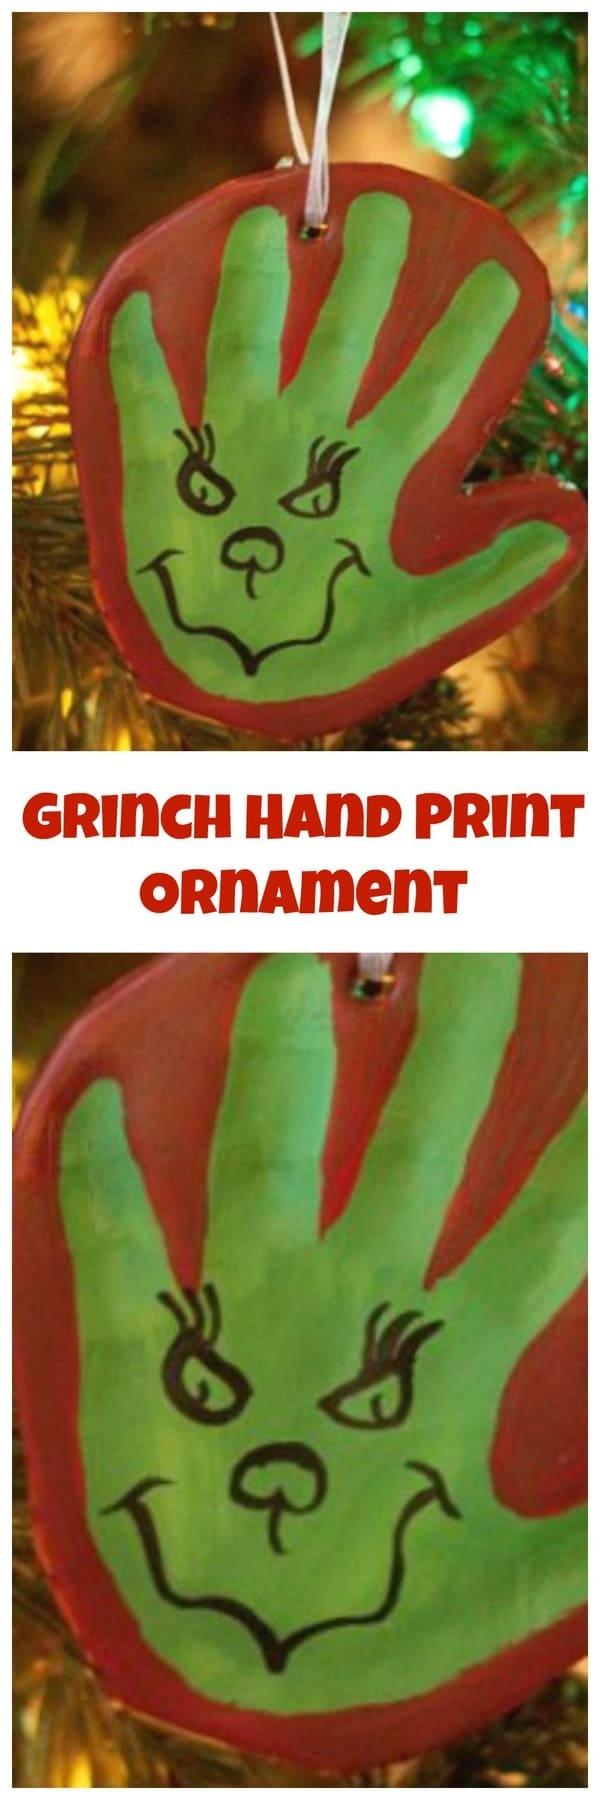 The Grinch Hand Print Diy Clay Ornament